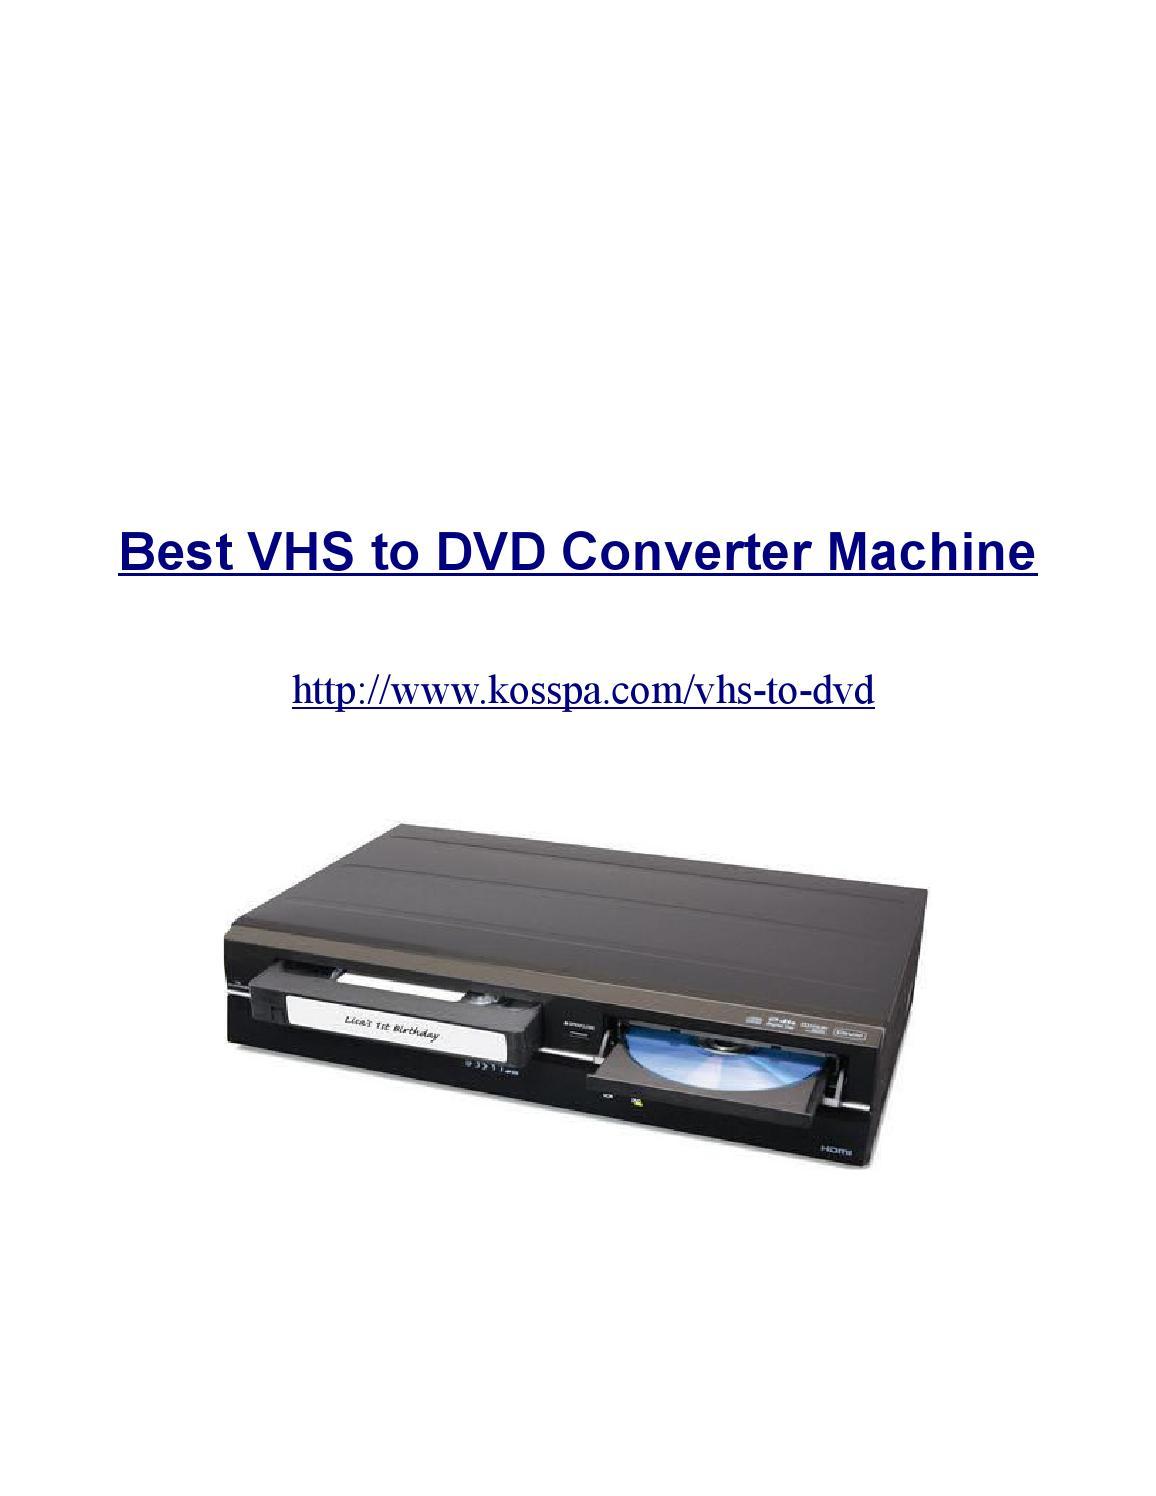 Vhs to dvd converter machine by alex jelic